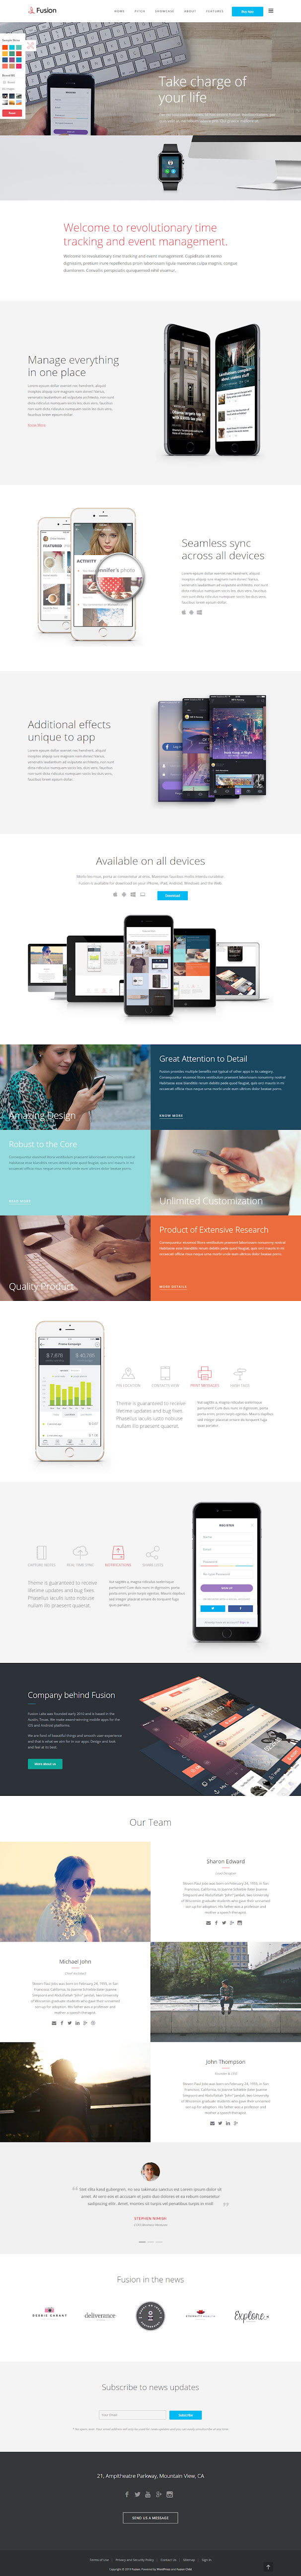 fusion best premium mobile app wordpress theme - 10+ Best Premium Mobile App WordPress Themes